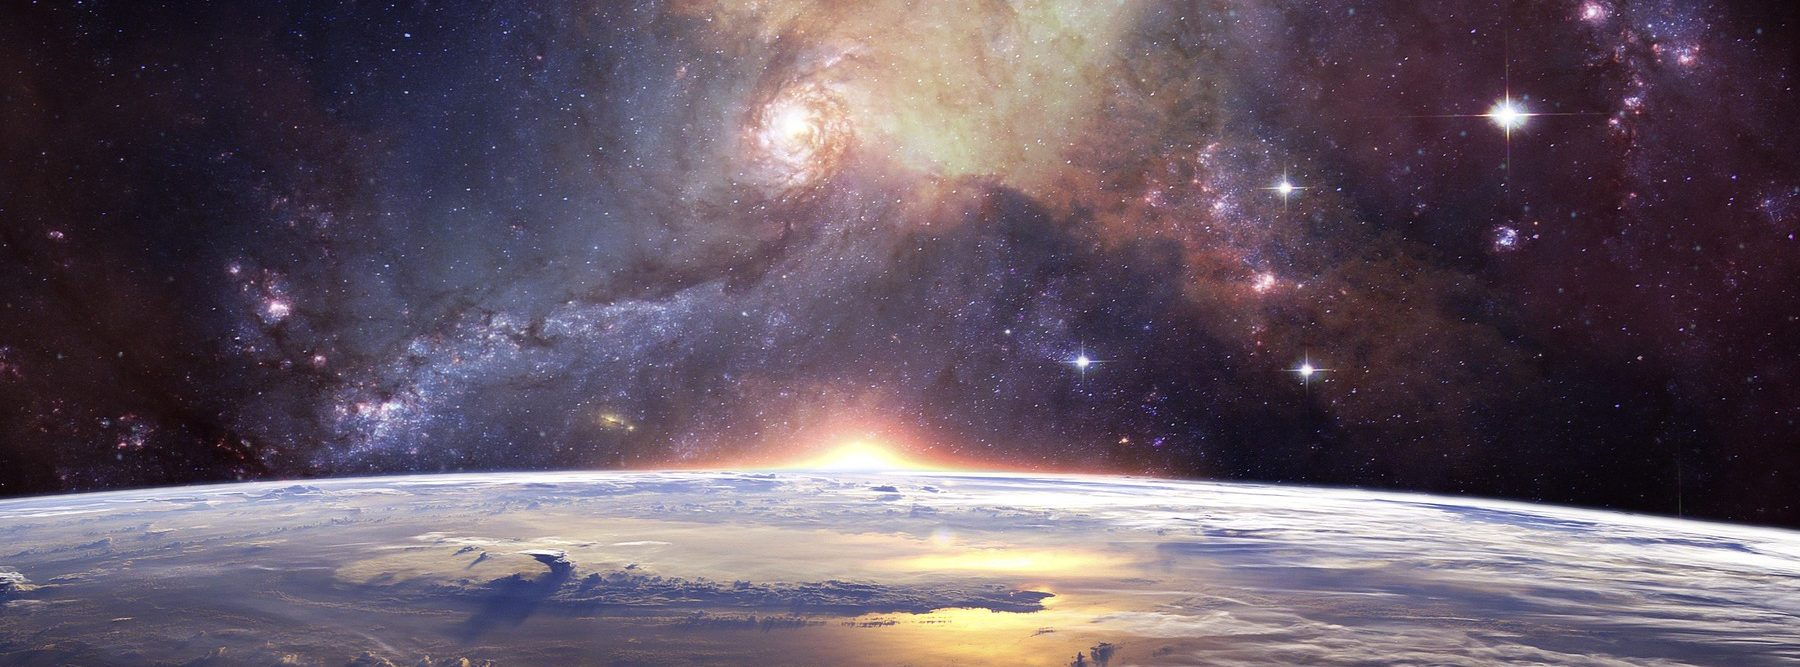 El universo nos espera